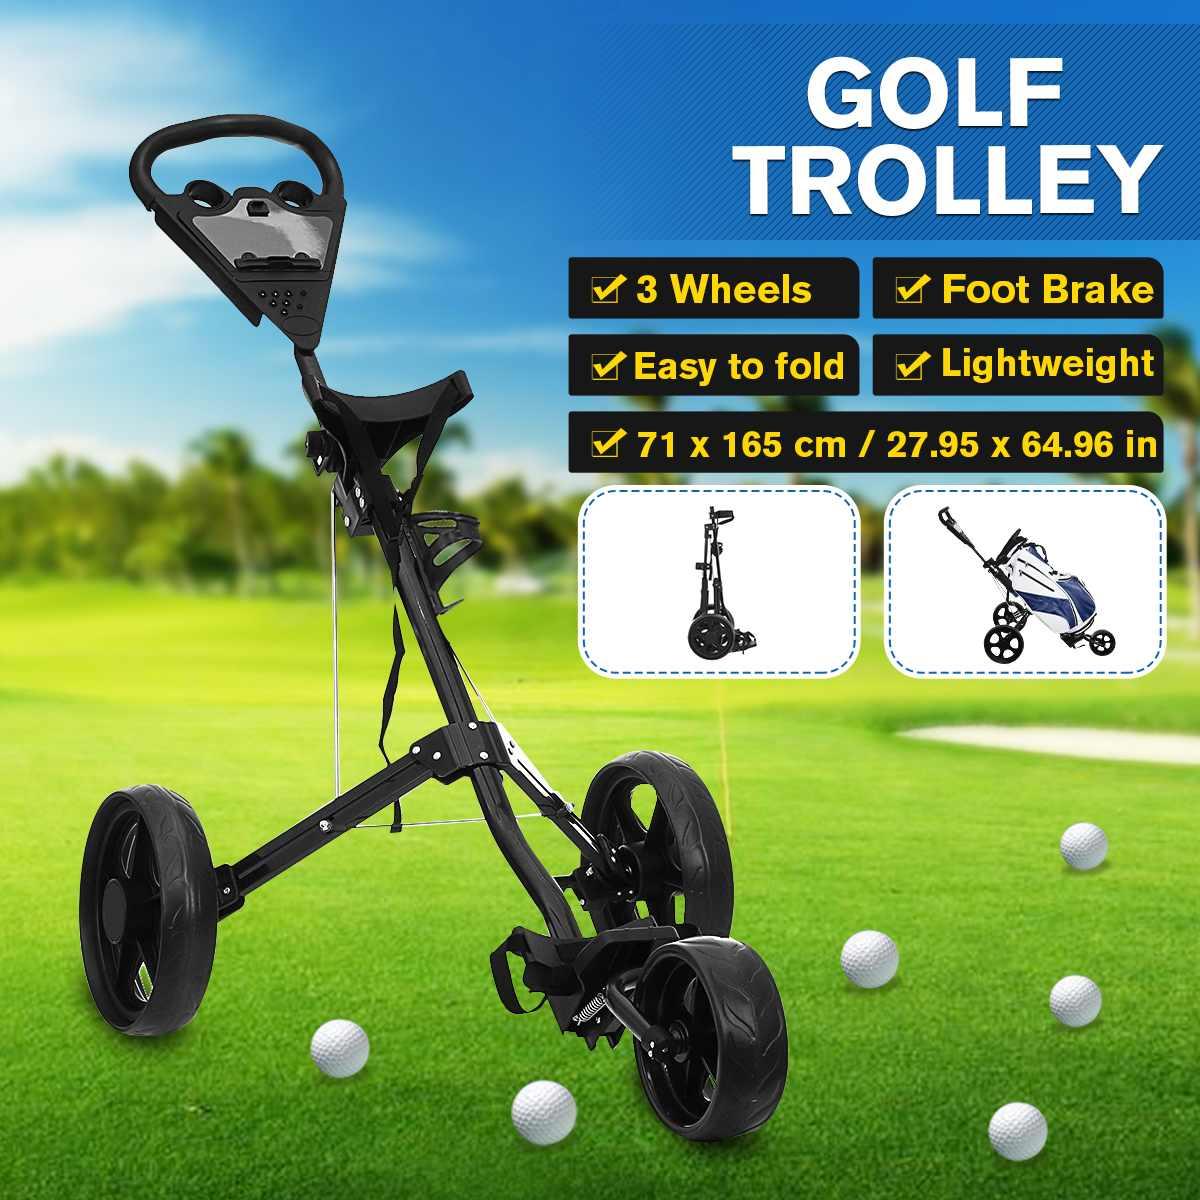 Golf Trolley Push Cart Professional Folding 3 Wheels Golf Bag Trolley Multifunctional Carrier Scorecard Cup Holder Foot Brake